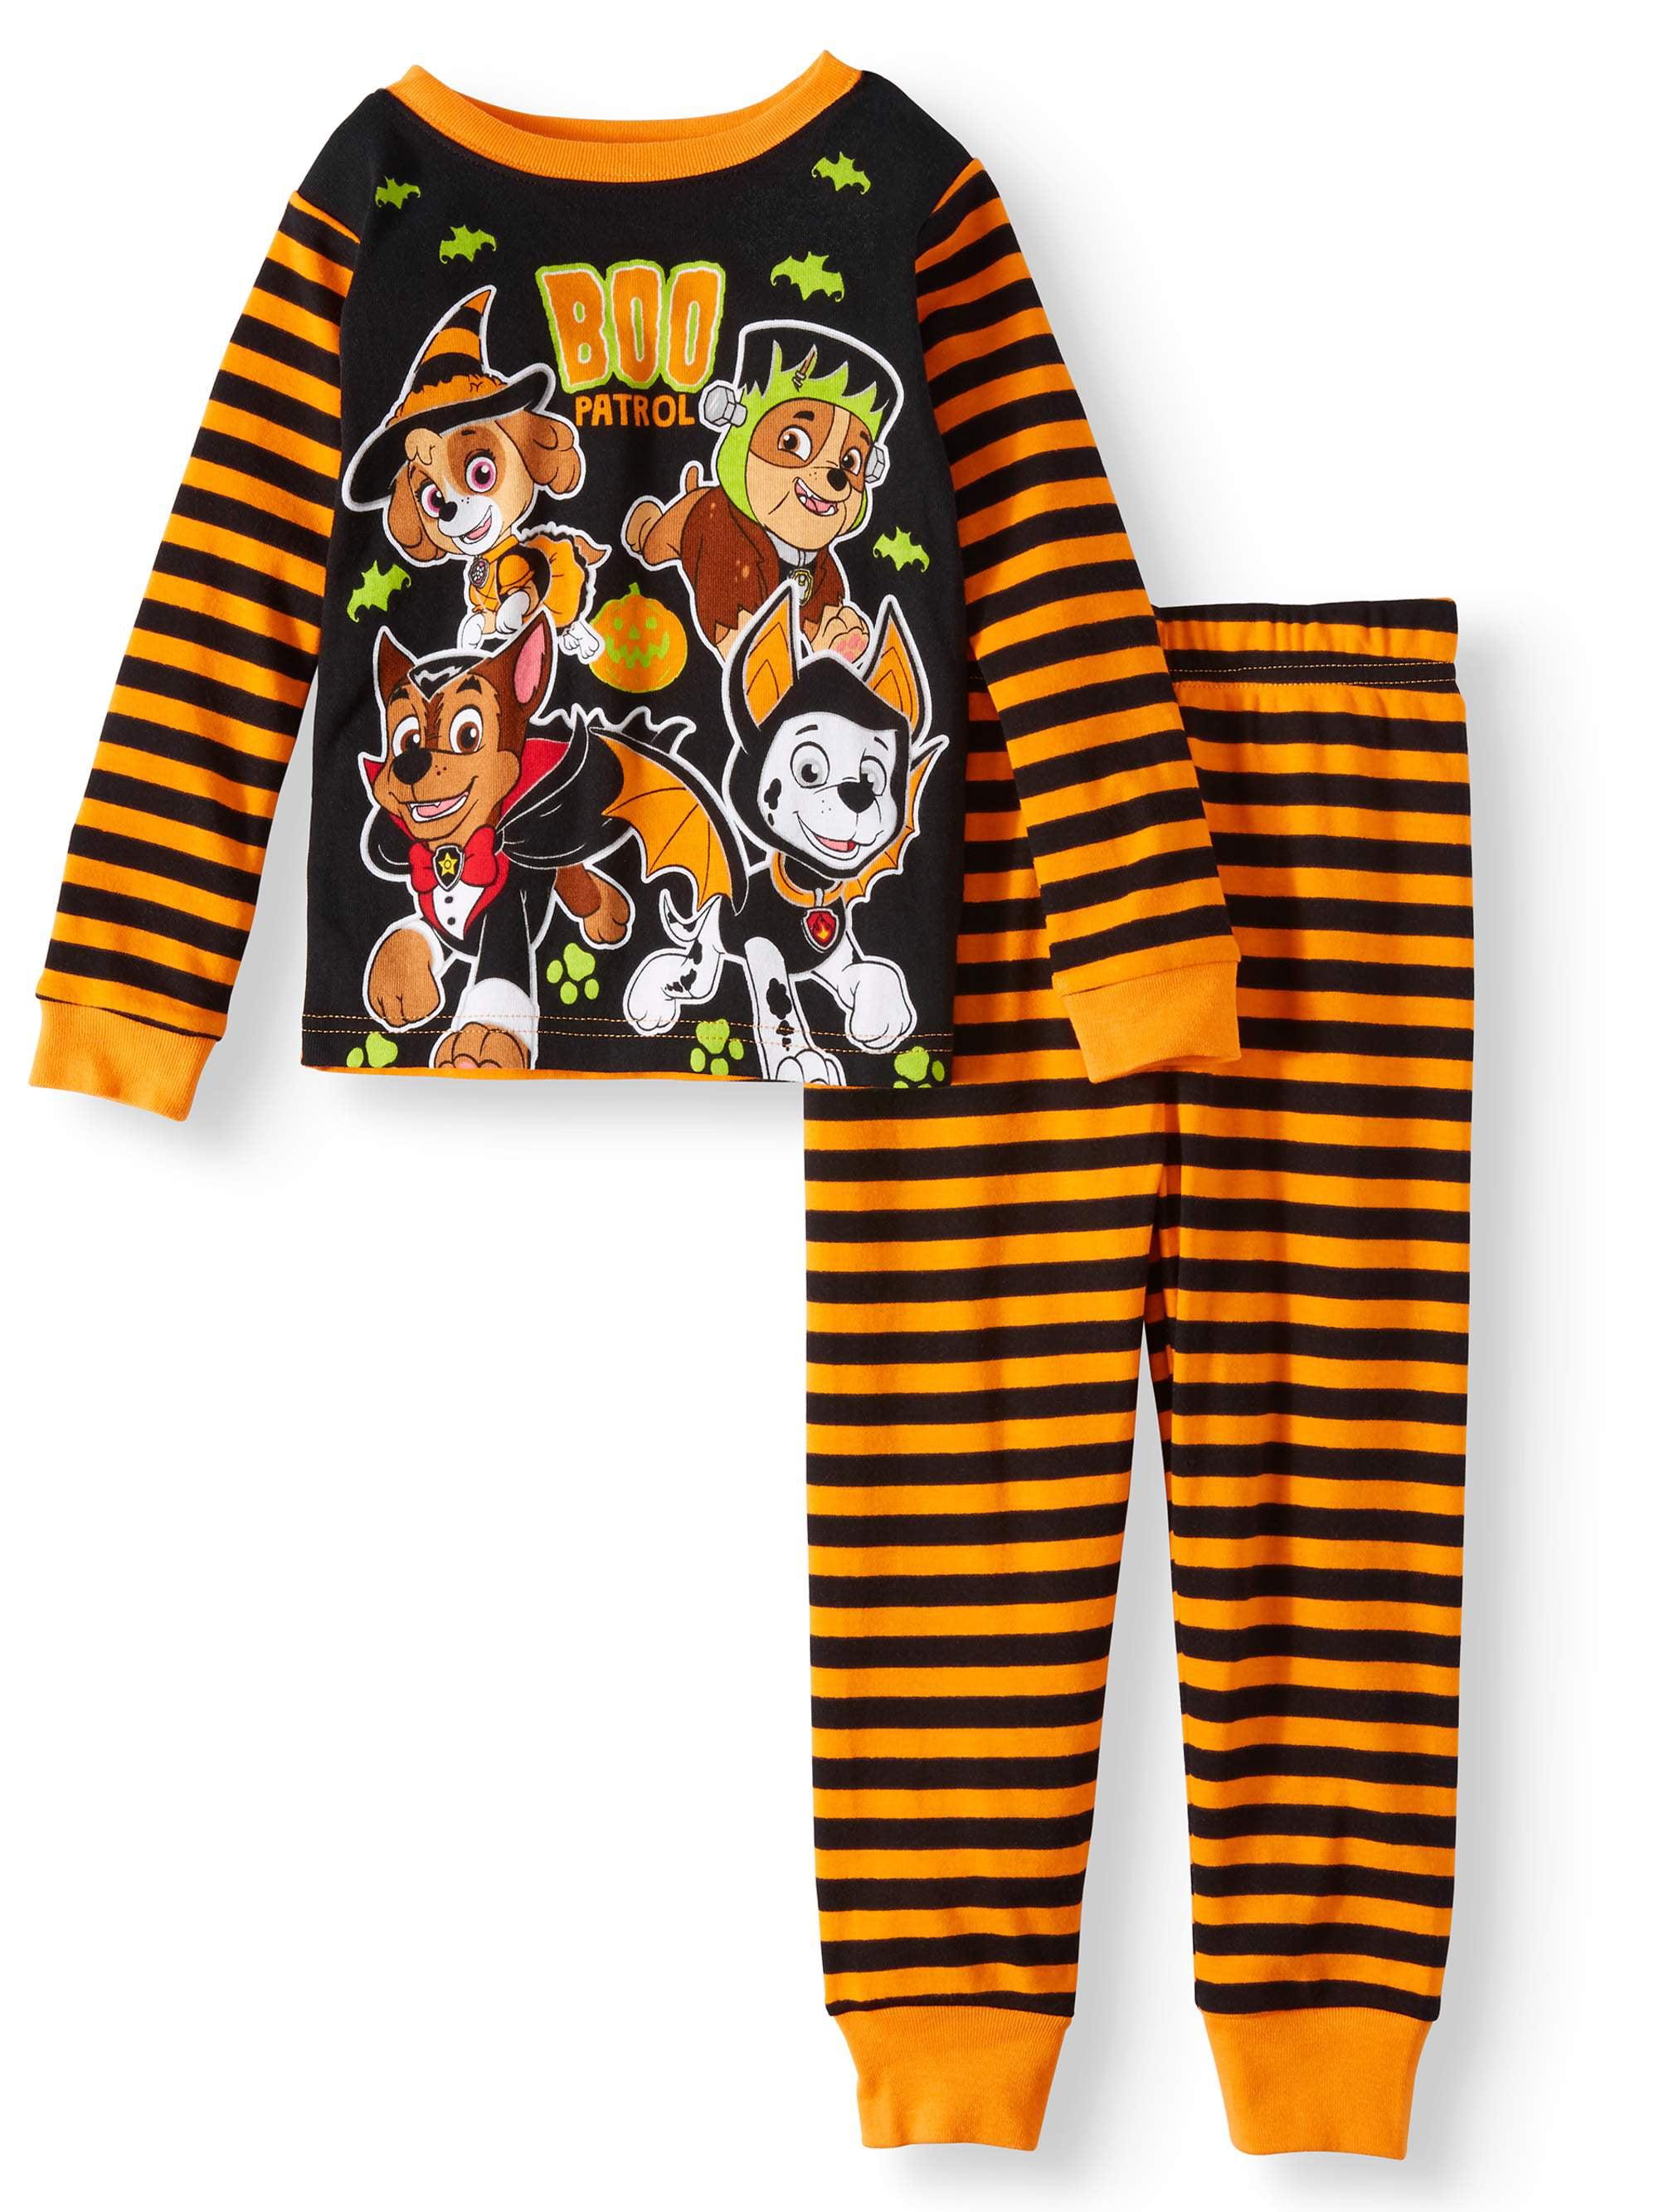 Paw Patrol Toddler Boy Glow in the Dark Halloween Pajamas New 4T